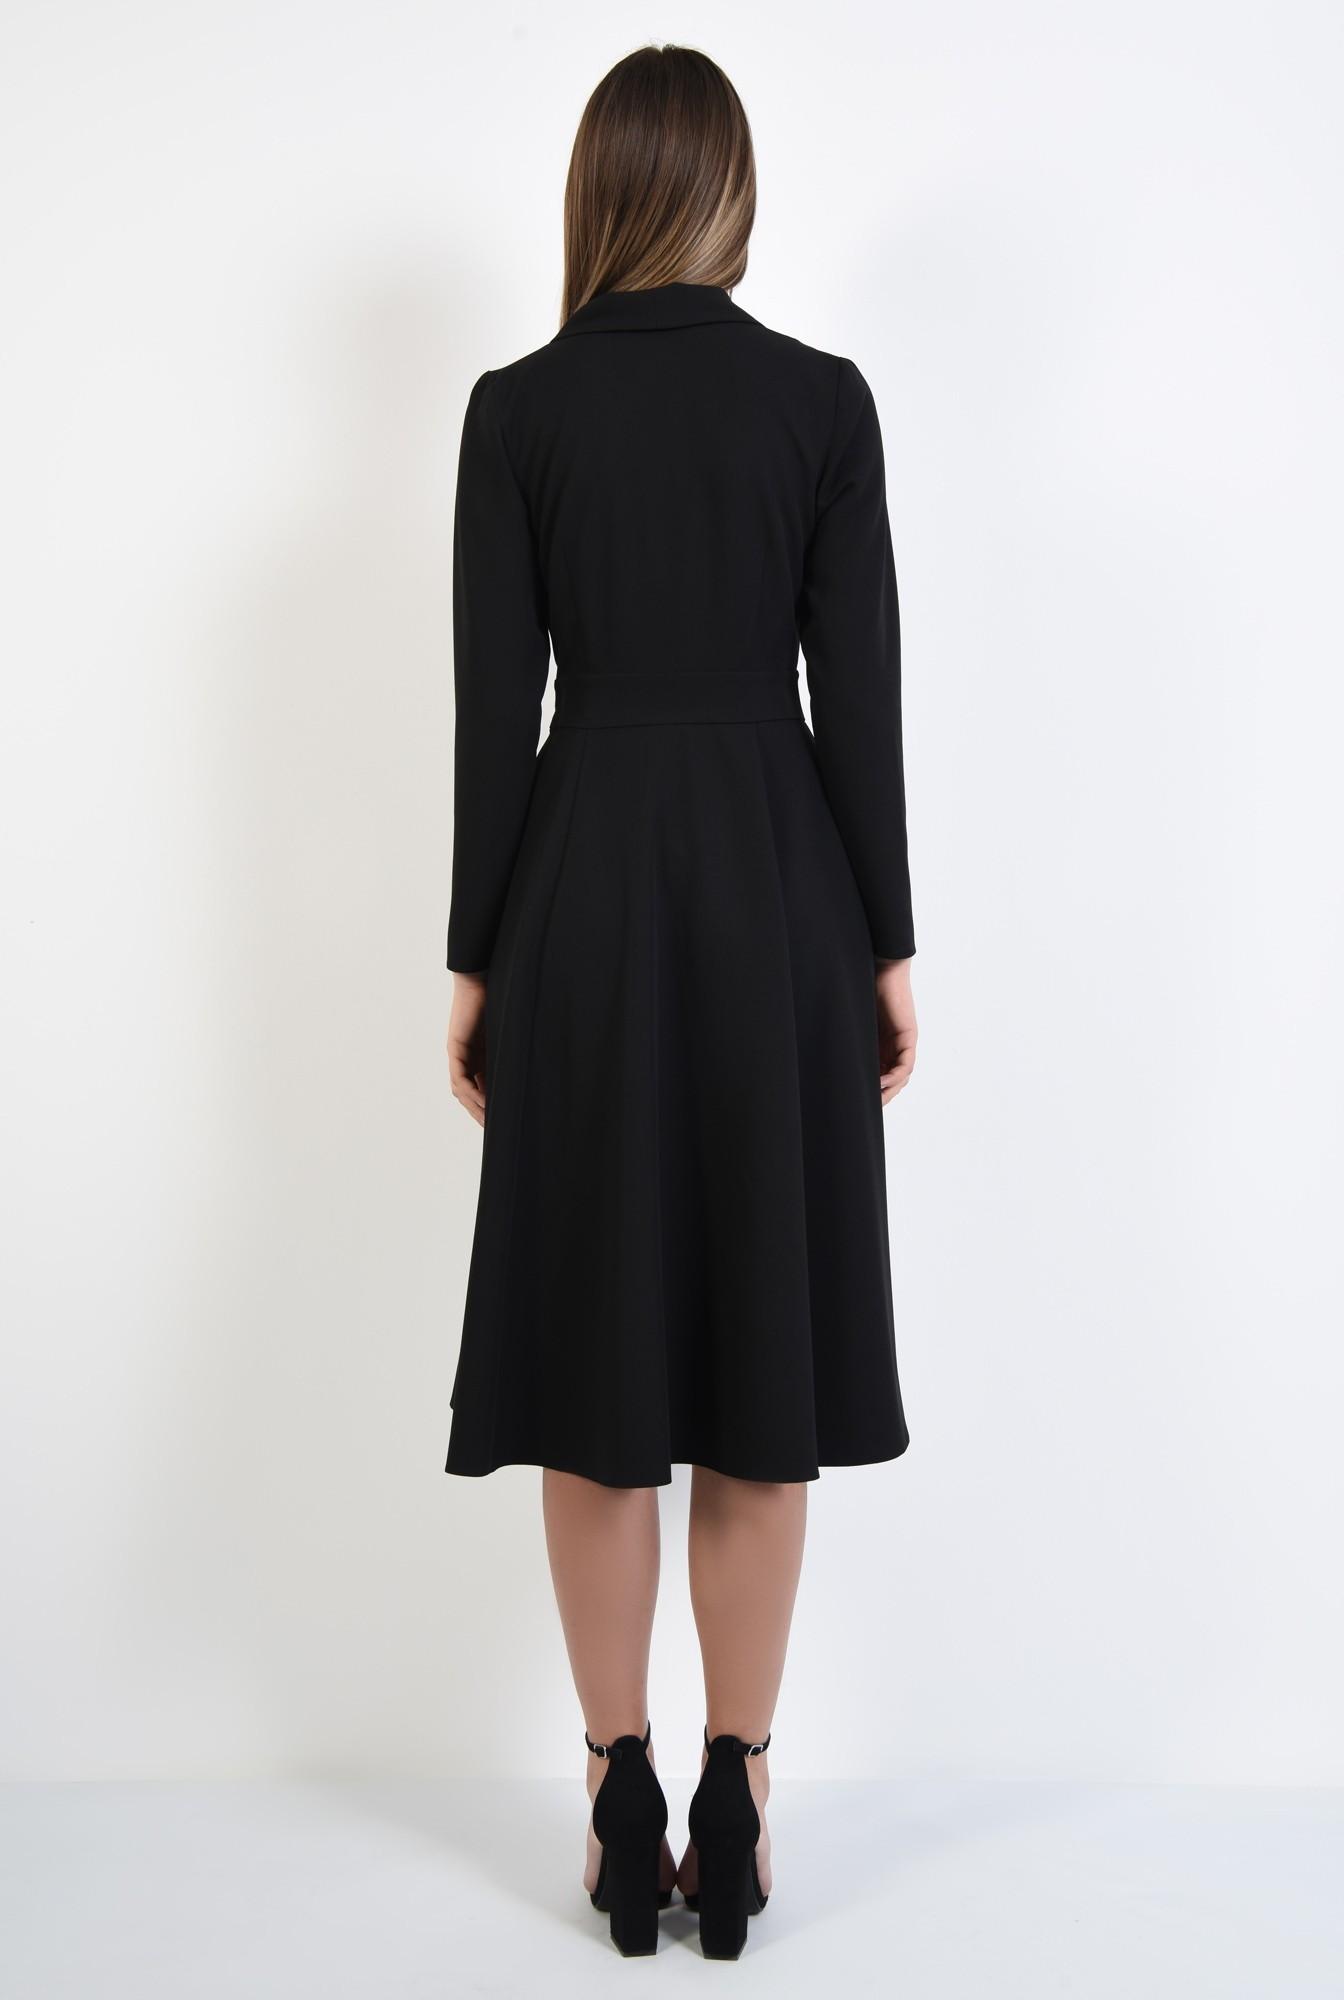 1 - rochie neagra, evazata, midi, talie cu betelie, maneci ajustate